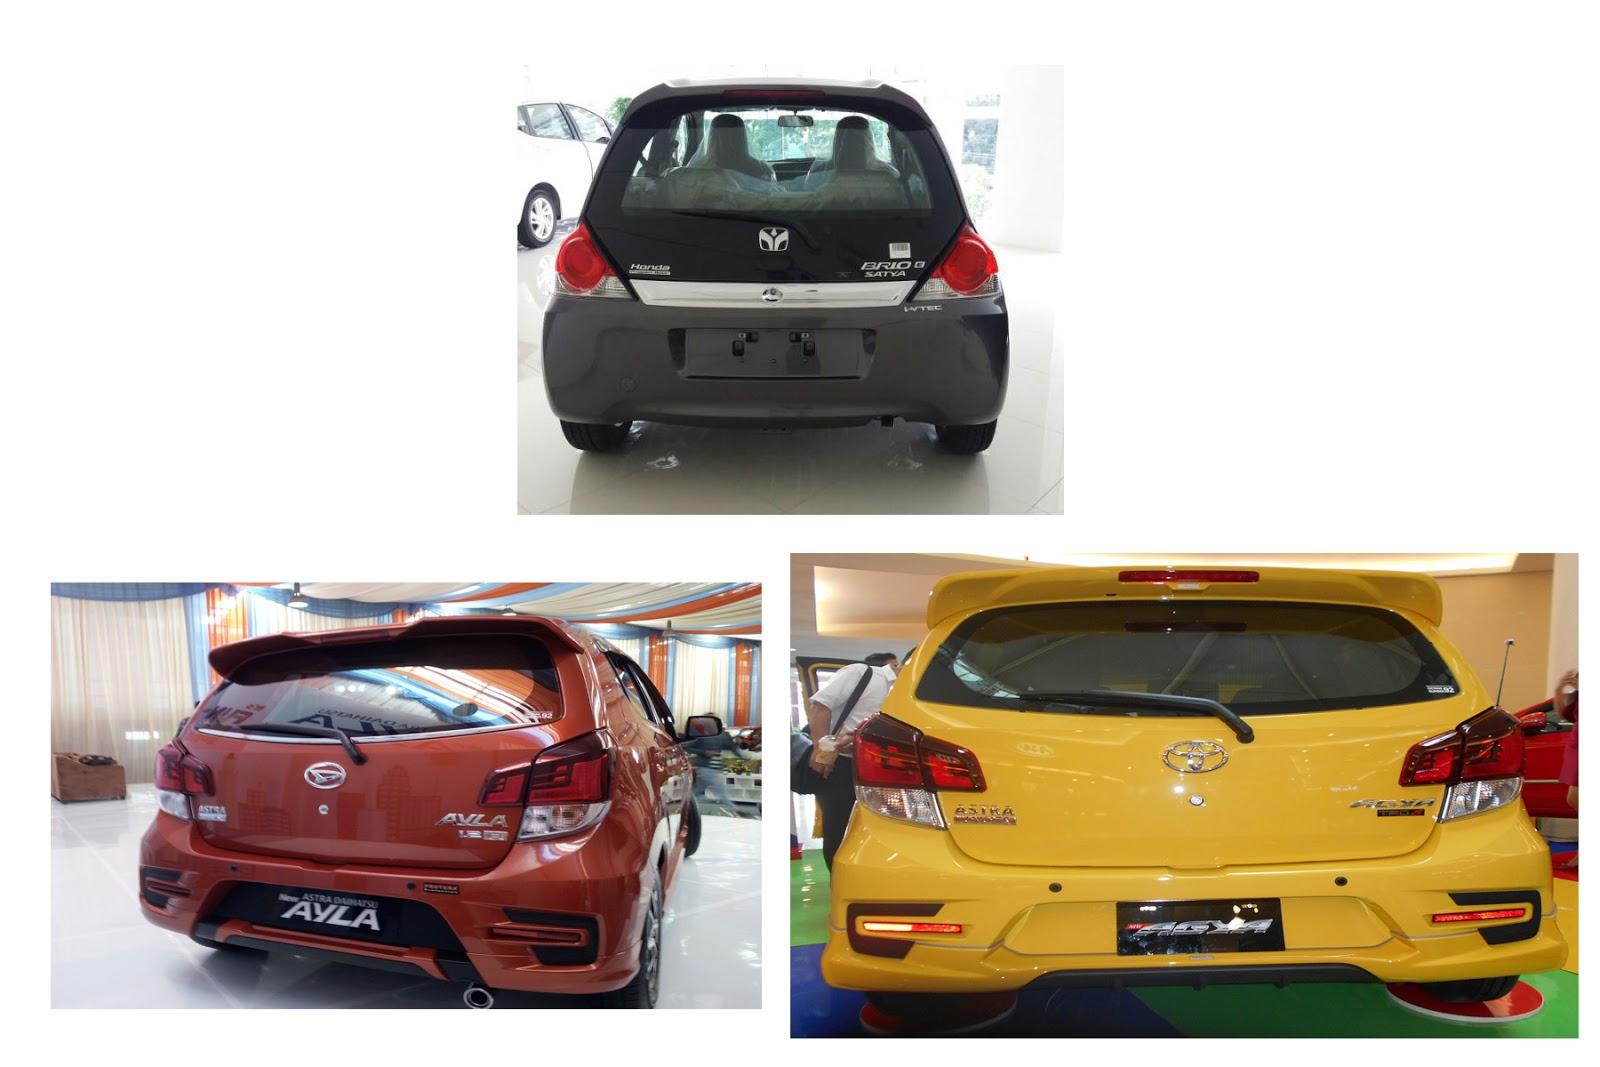 Interior New Agya Trd 2017 Kompresi Grand Avanza Adu Keunggulan Dan Kelebihan Toyota Vs